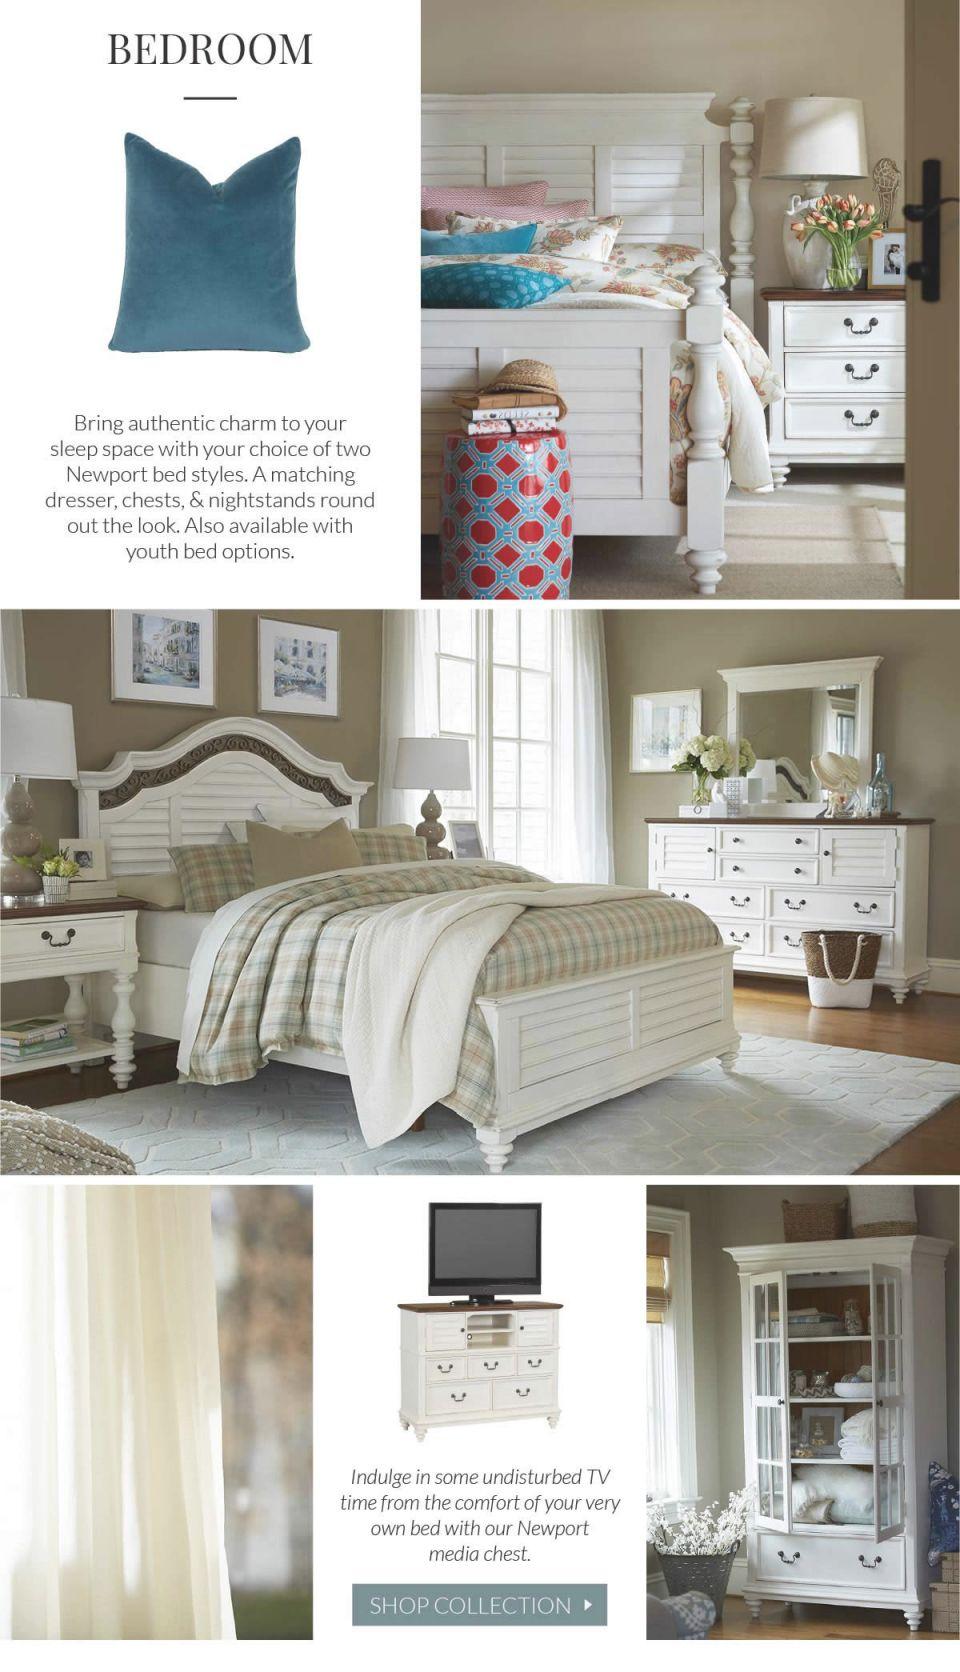 Havertys Bedroom : havertys, bedroom, Havertys, Newport, Lookbook, Regard, Bedroom, Awesome, Decors